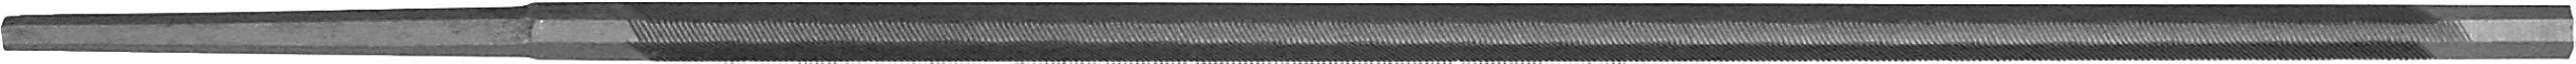 PFERD 17081 Chisel Bit Chain Saw Sharpening File, Three Square Shape, 7